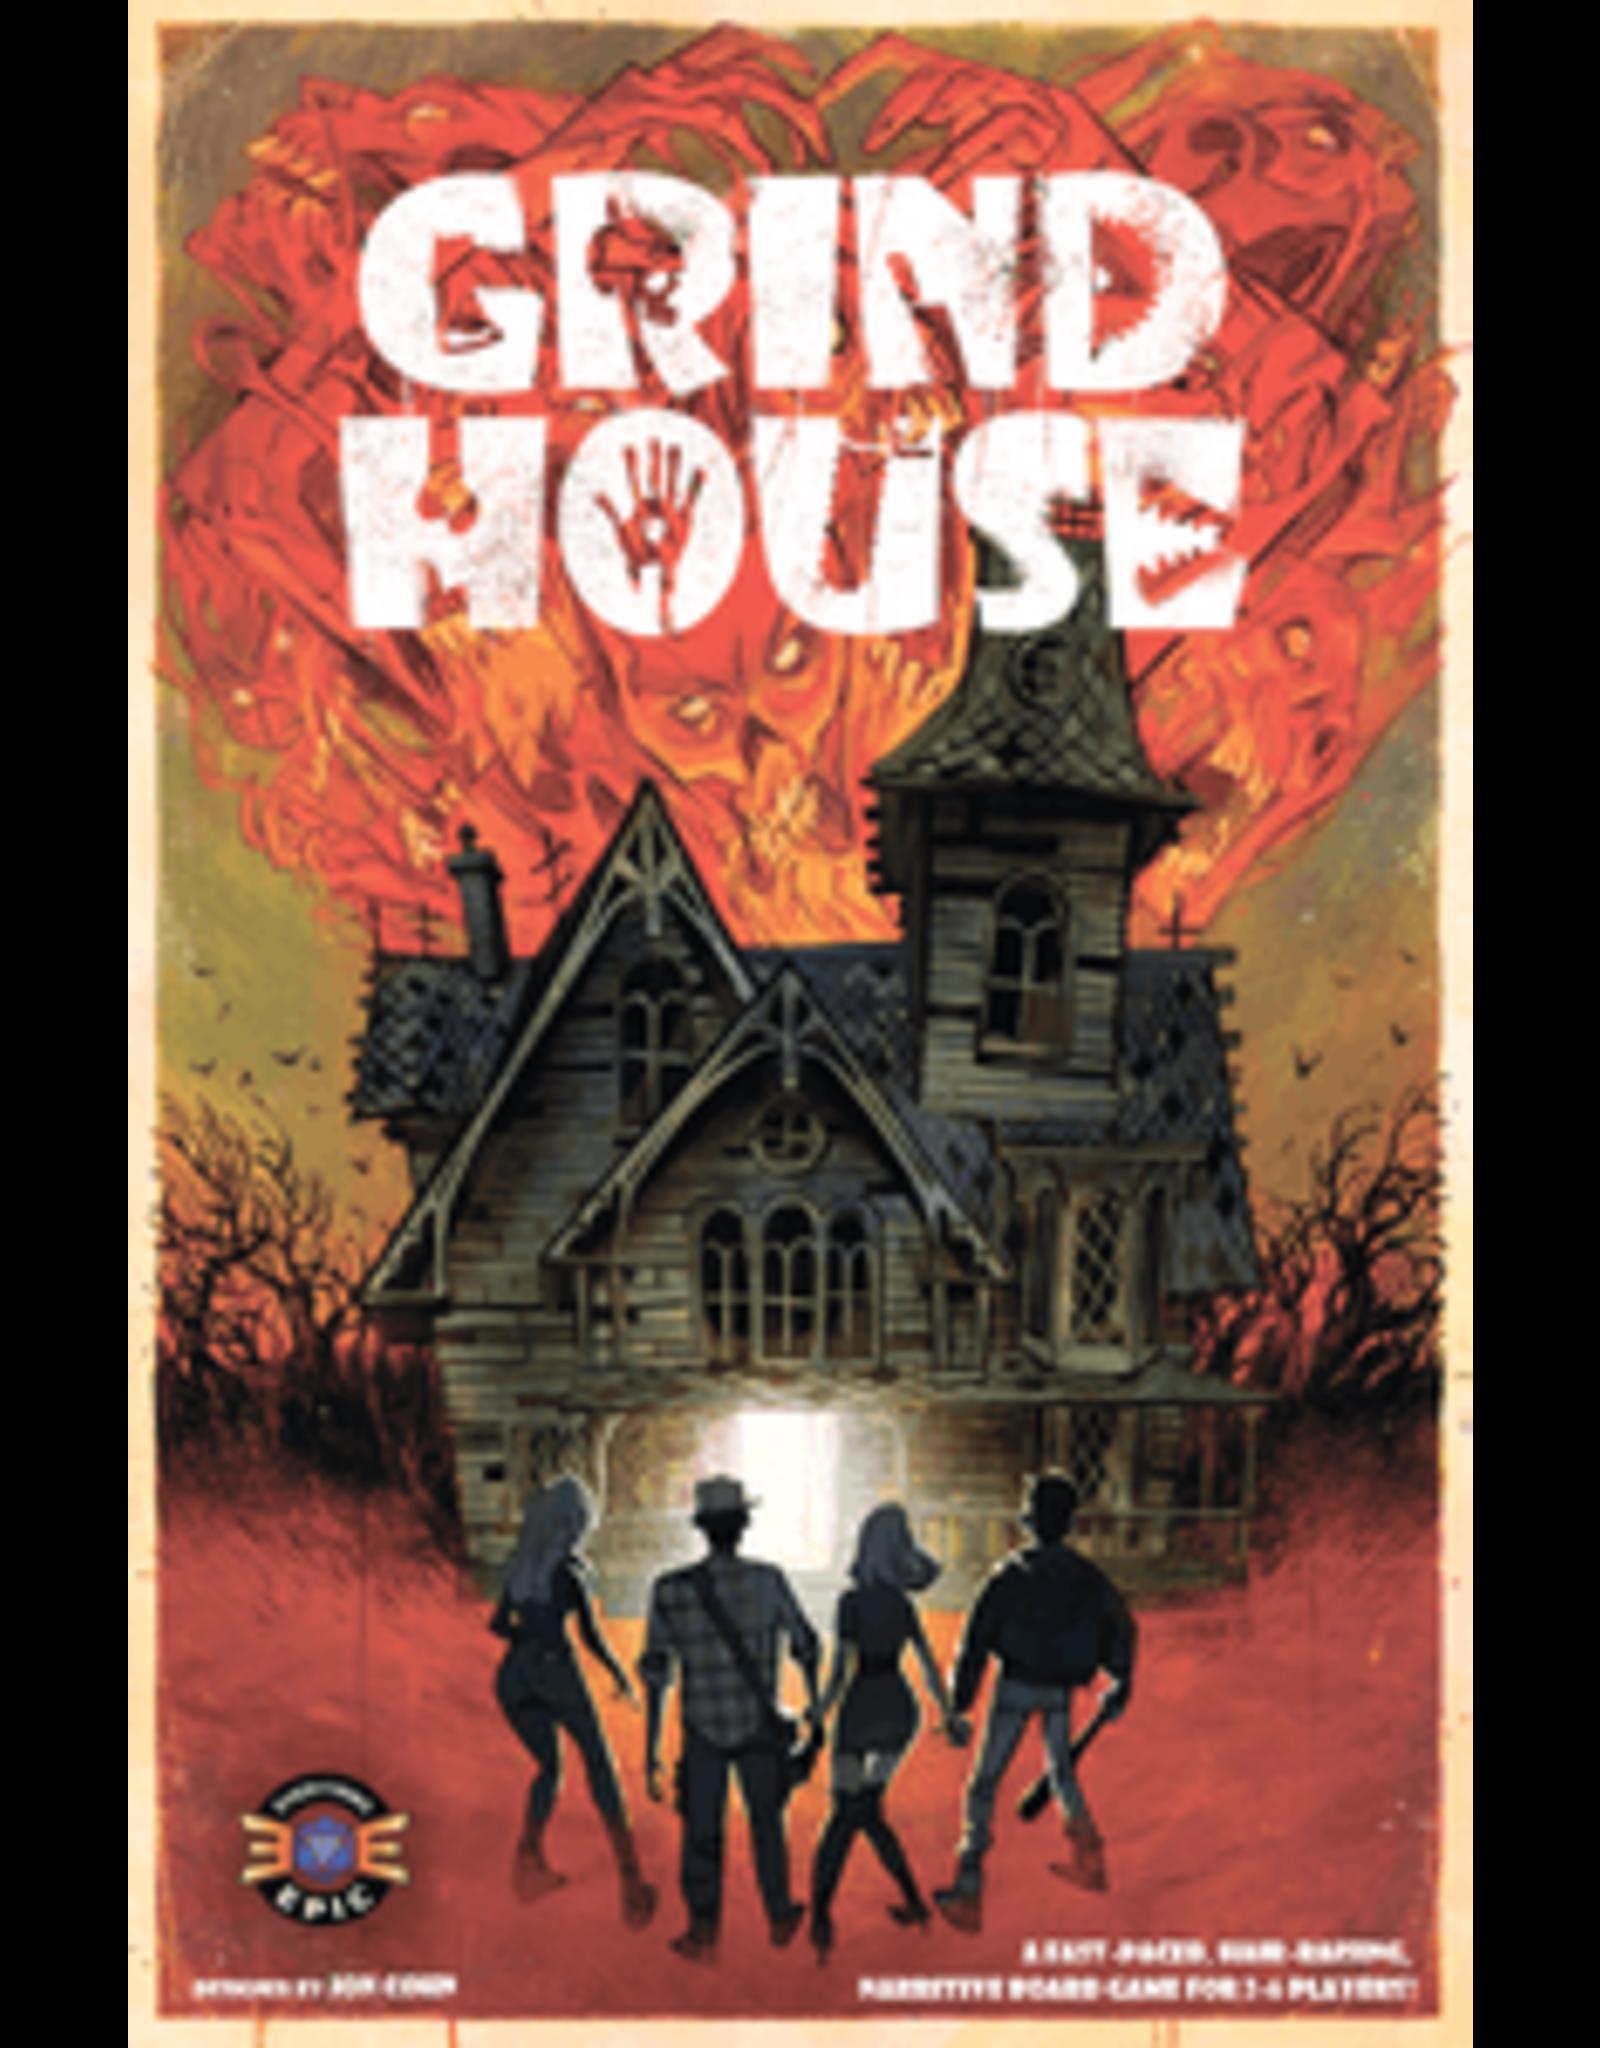 Grind House